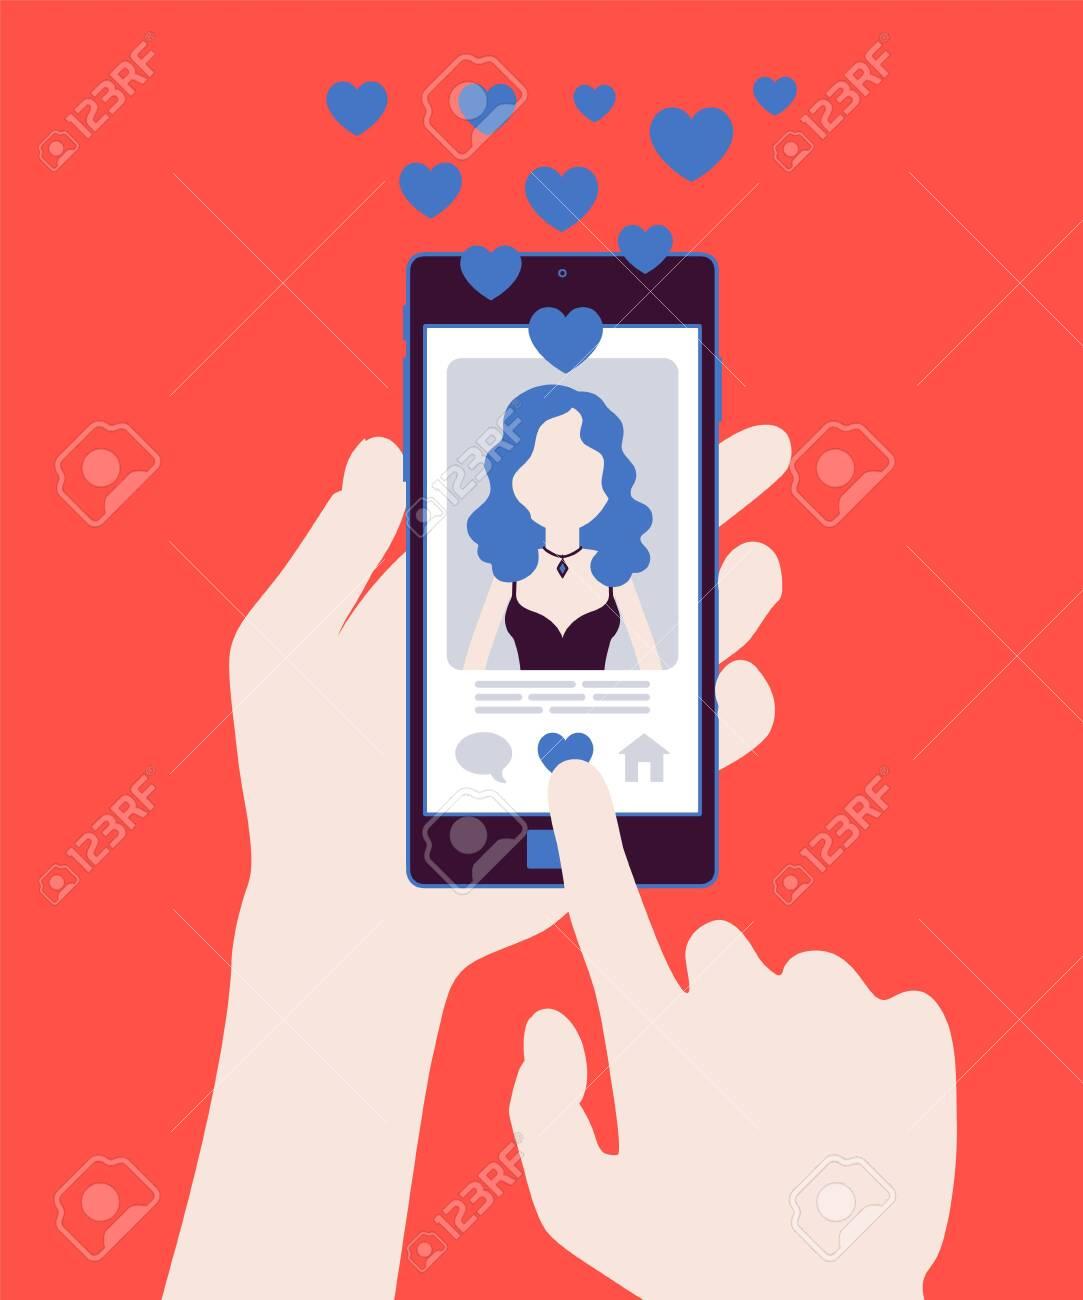 Mobile singles dating